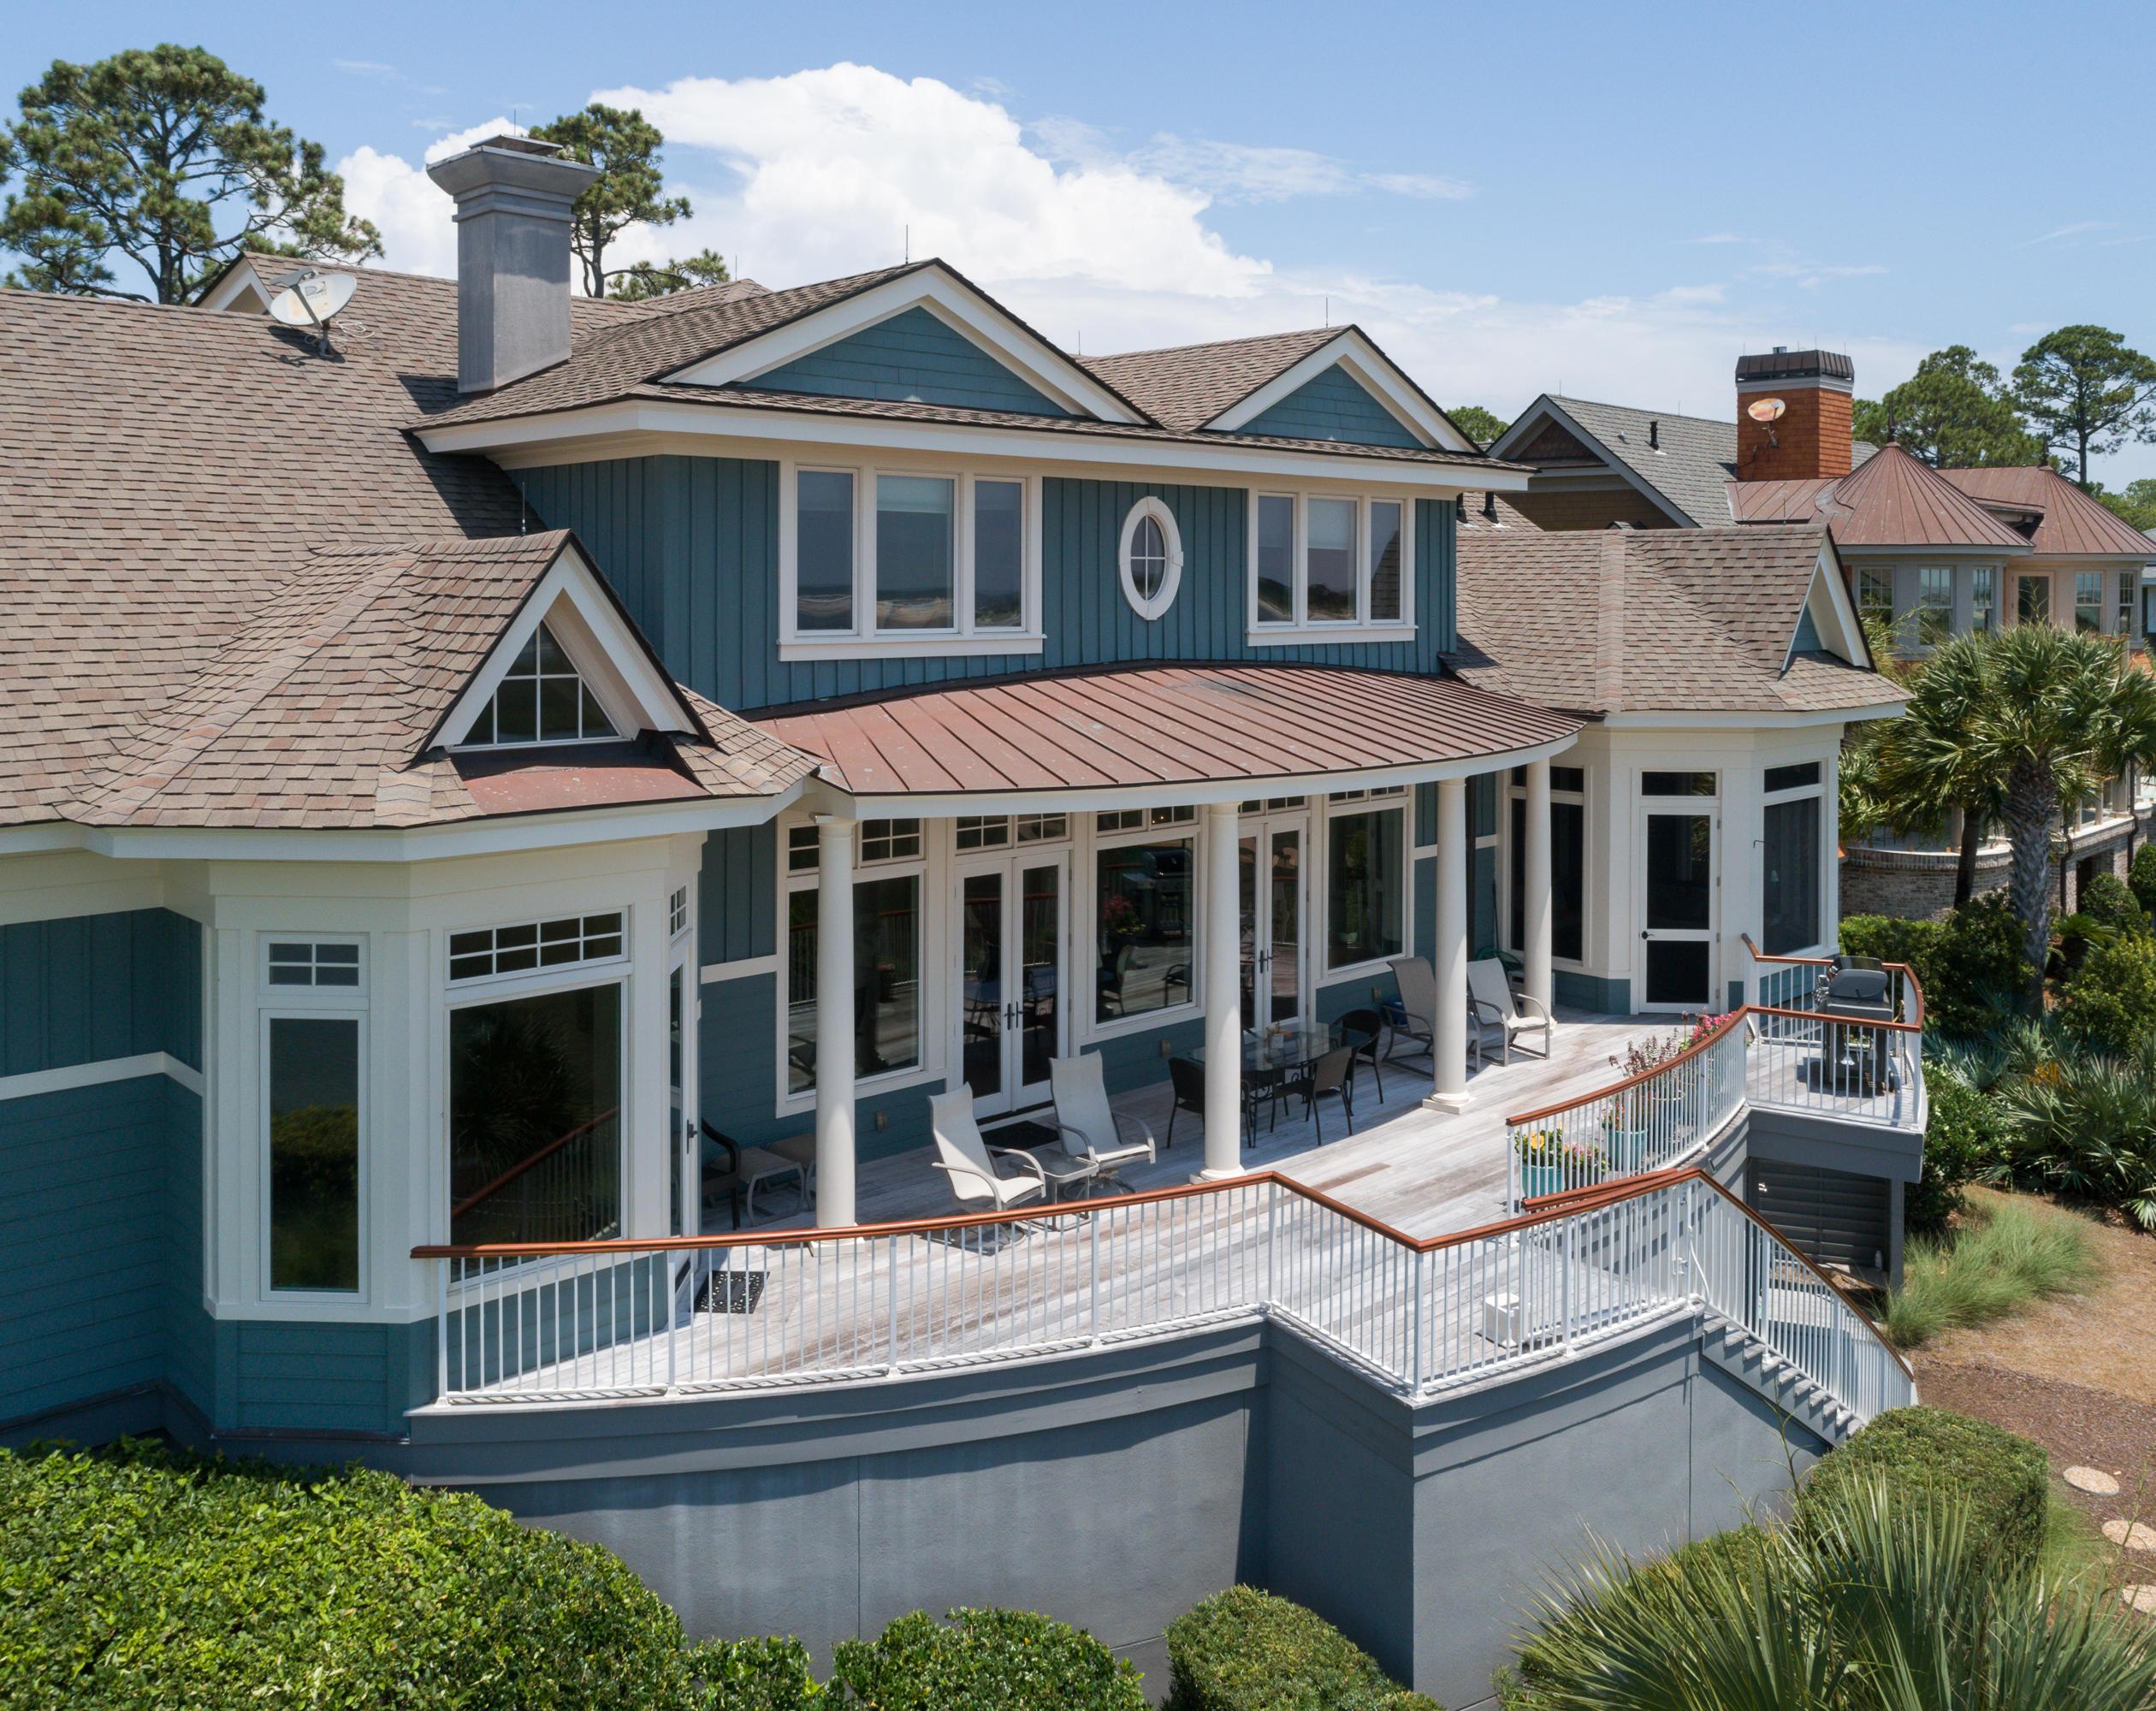 Seabrook Island Homes For Sale - 3033 Marshgate, Johns Island, SC - 18